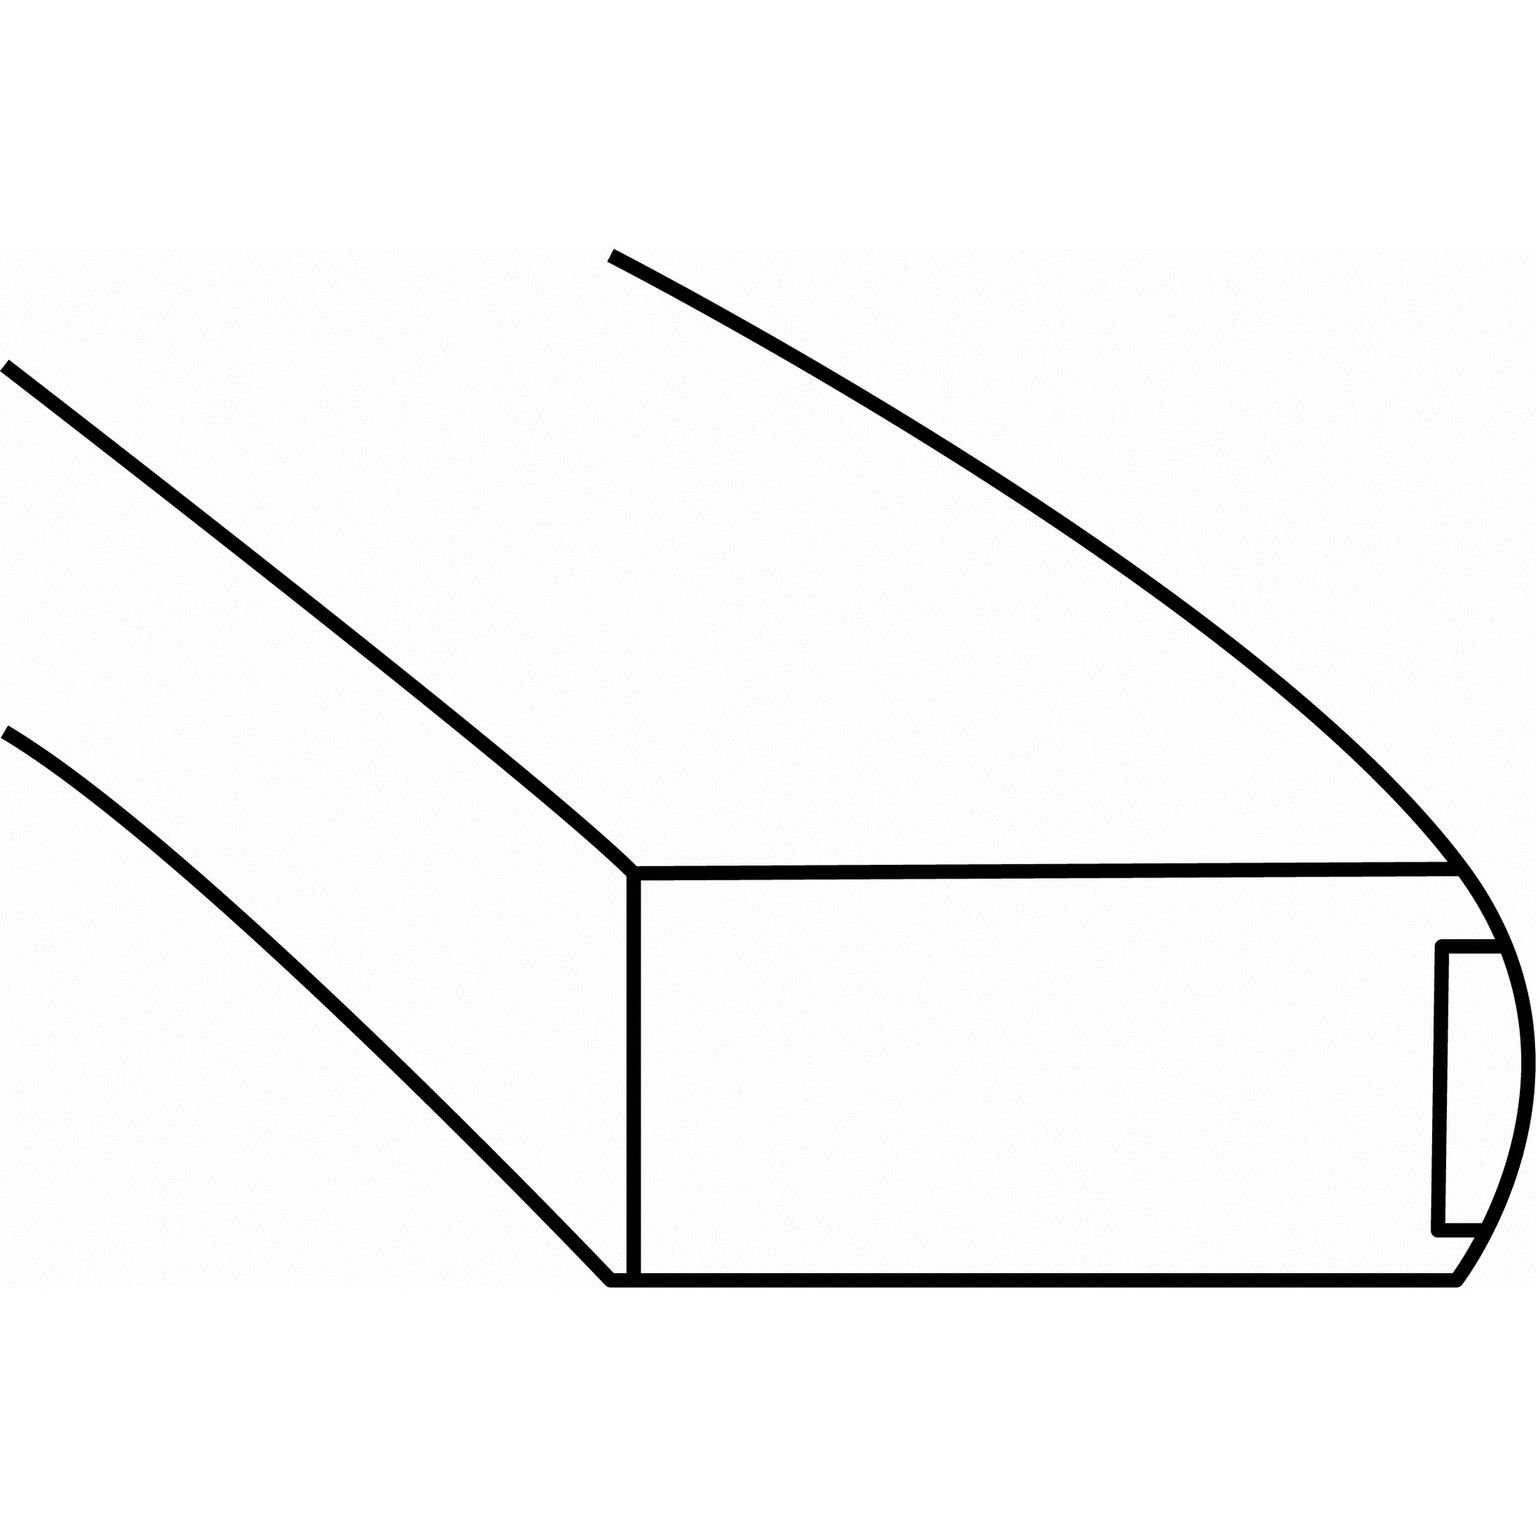 1989 Dodge Spirit Engine Piston Ring Set 4 Cyl 2.5L (Sealed Power E-454K)  Type: Premium Piston Ring Set 2-1.50MM, 1-4.00MM Premium Moly Standard Size  .